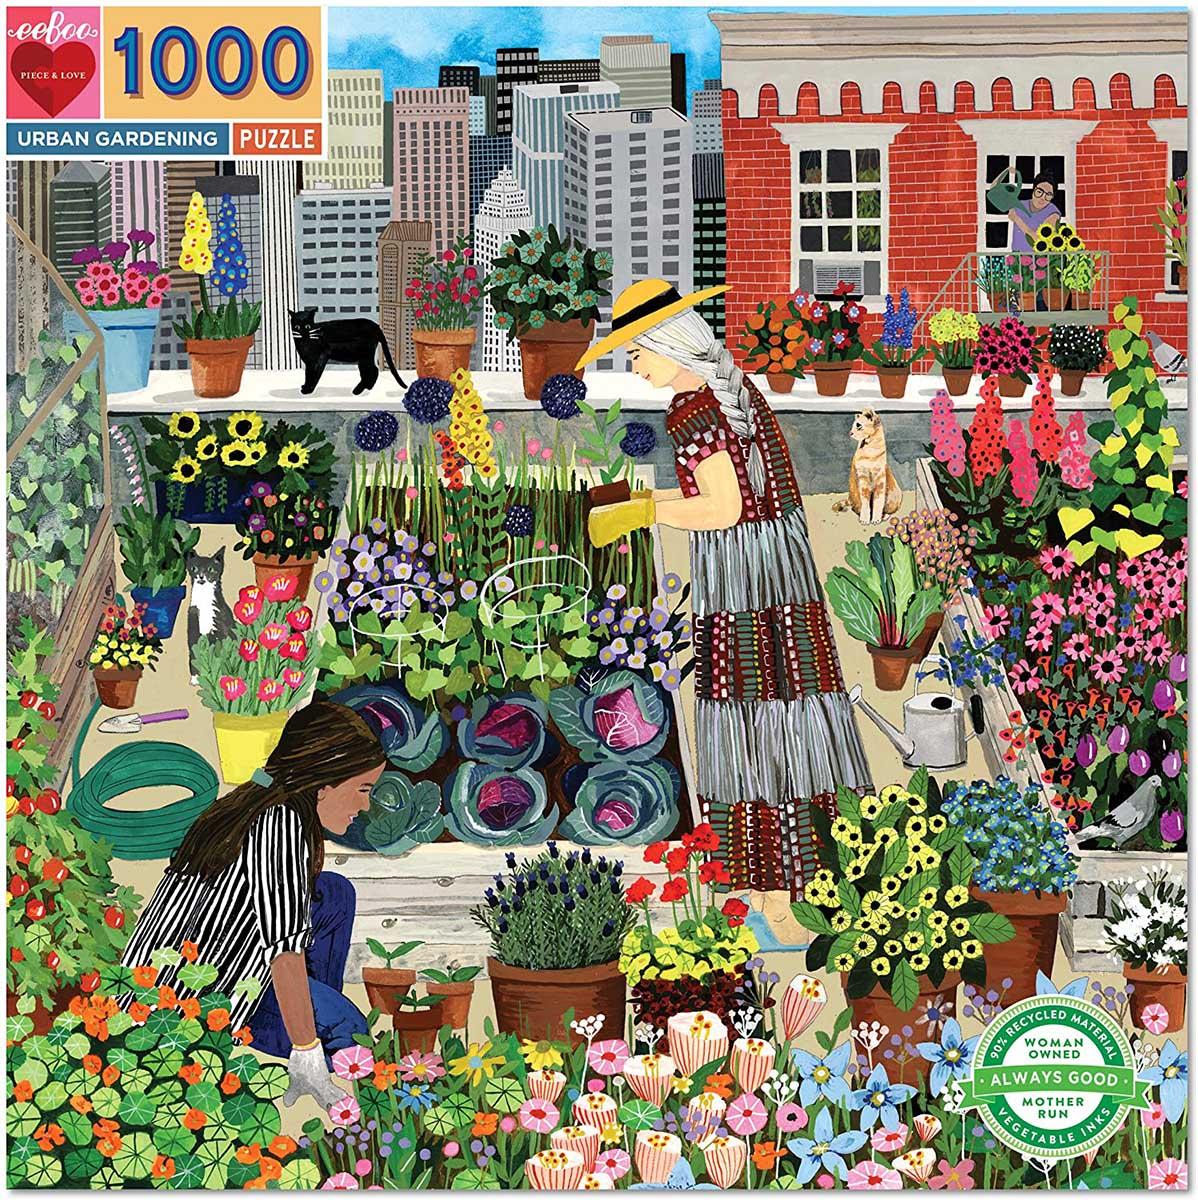 Urban Gardening Street Scene Jigsaw Puzzle